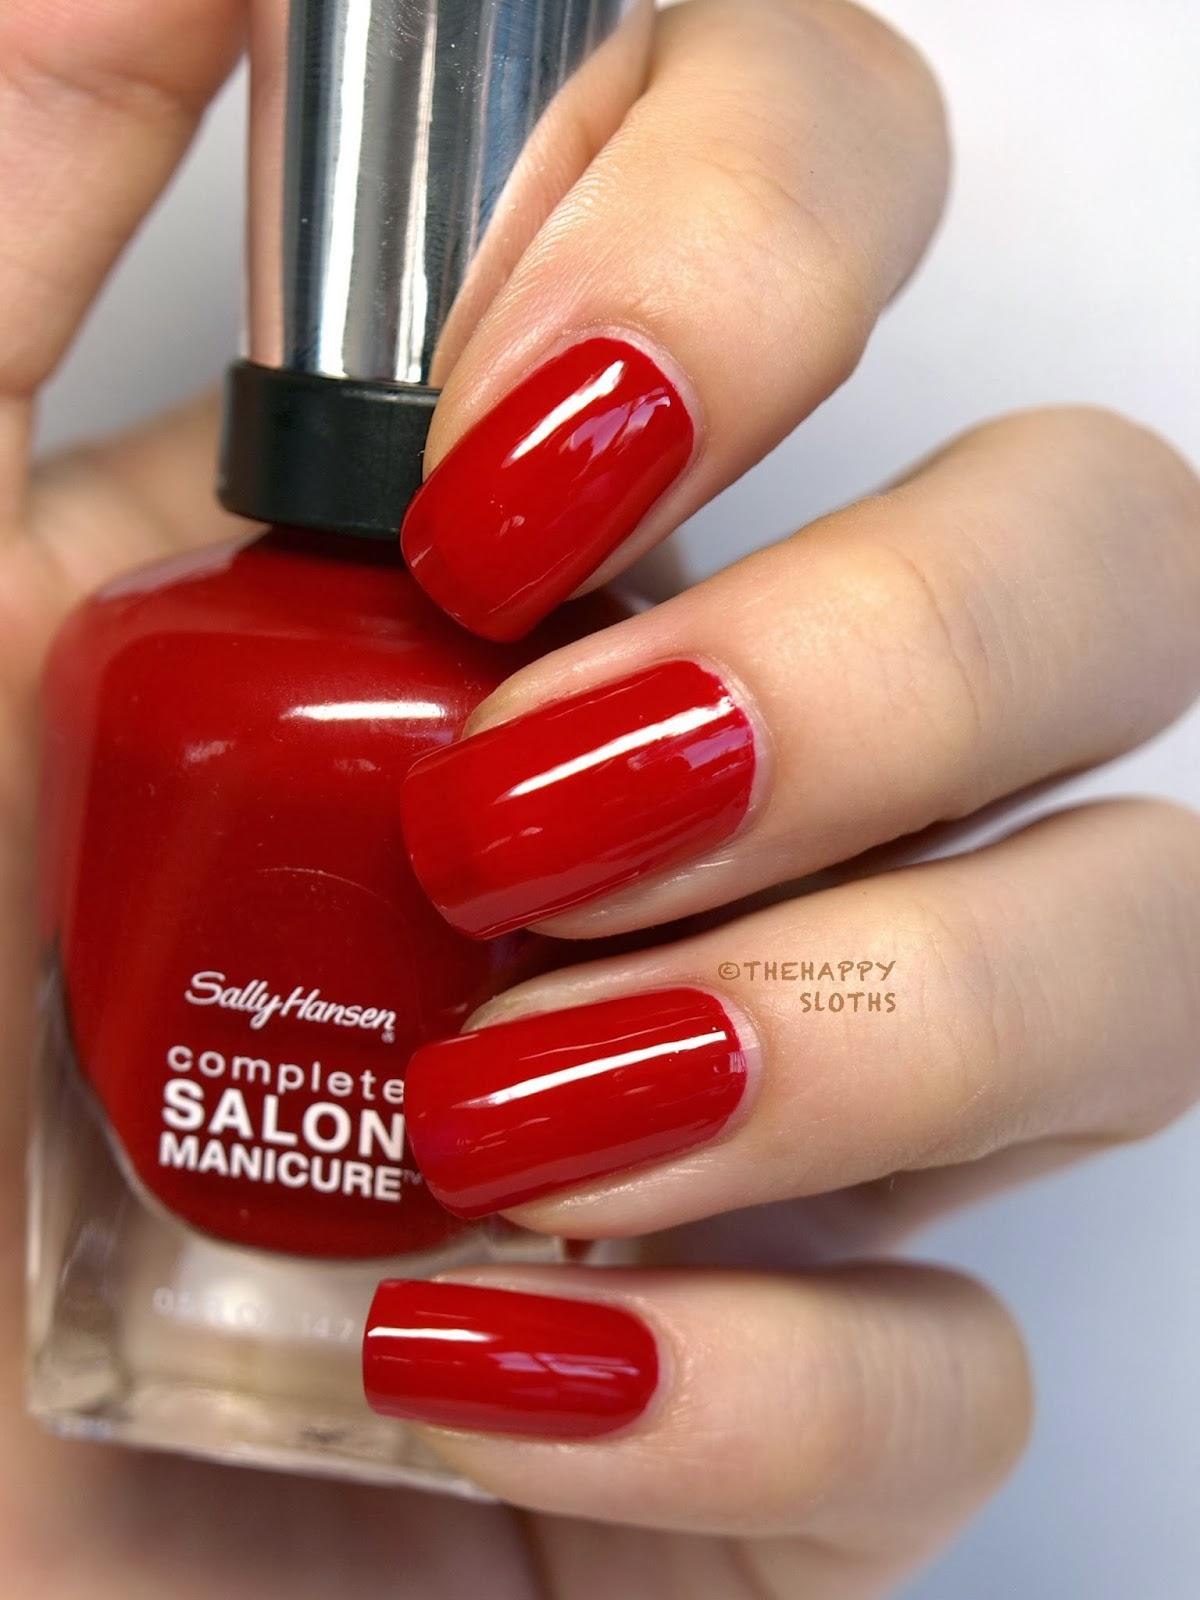 Sally hansen csmtko complete salon manicure nail polish for Salon manicure